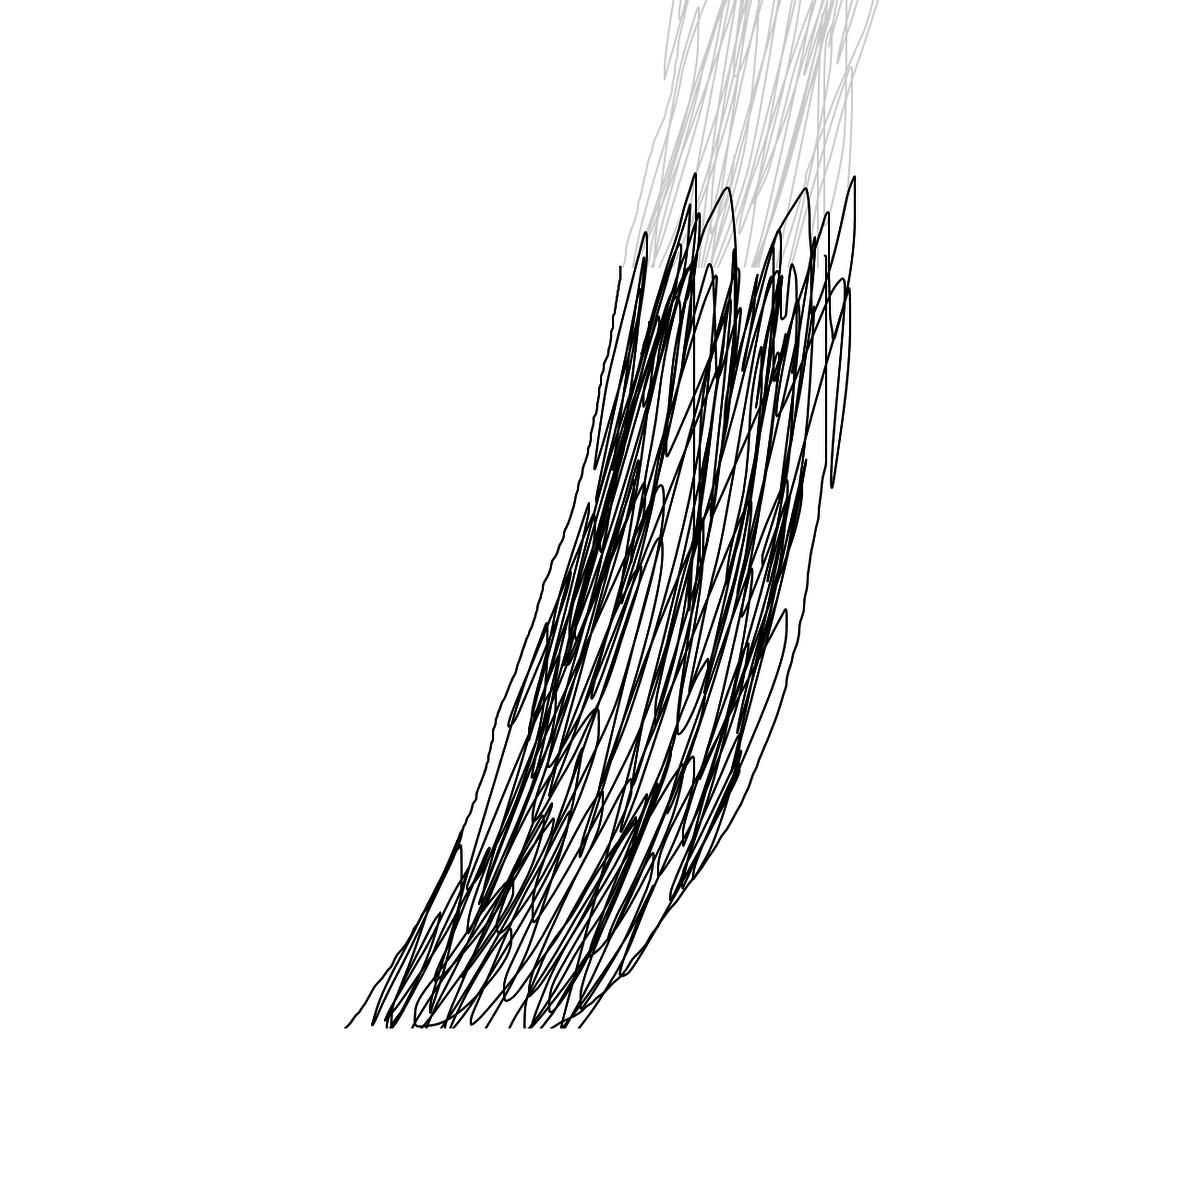 BAAAM drawing#11413 lat:52.4758758544921900lng: 13.4057960510253900